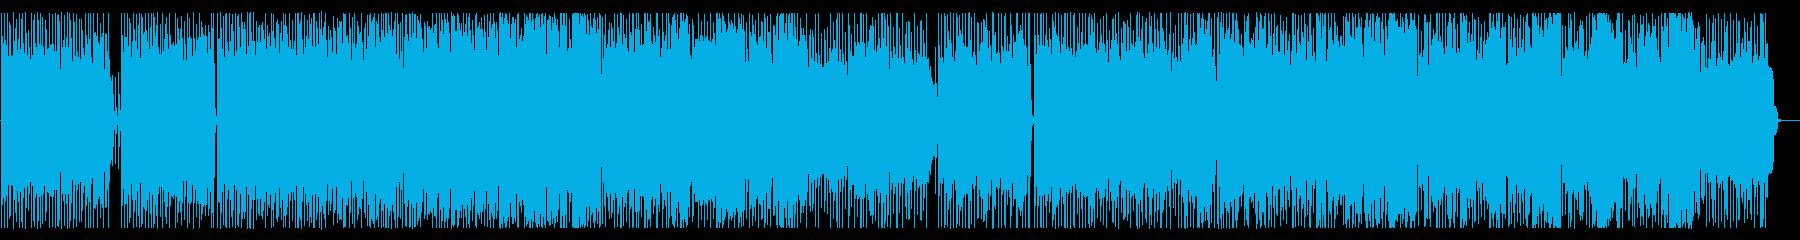 Transparent female vocal pop's reproduced waveform